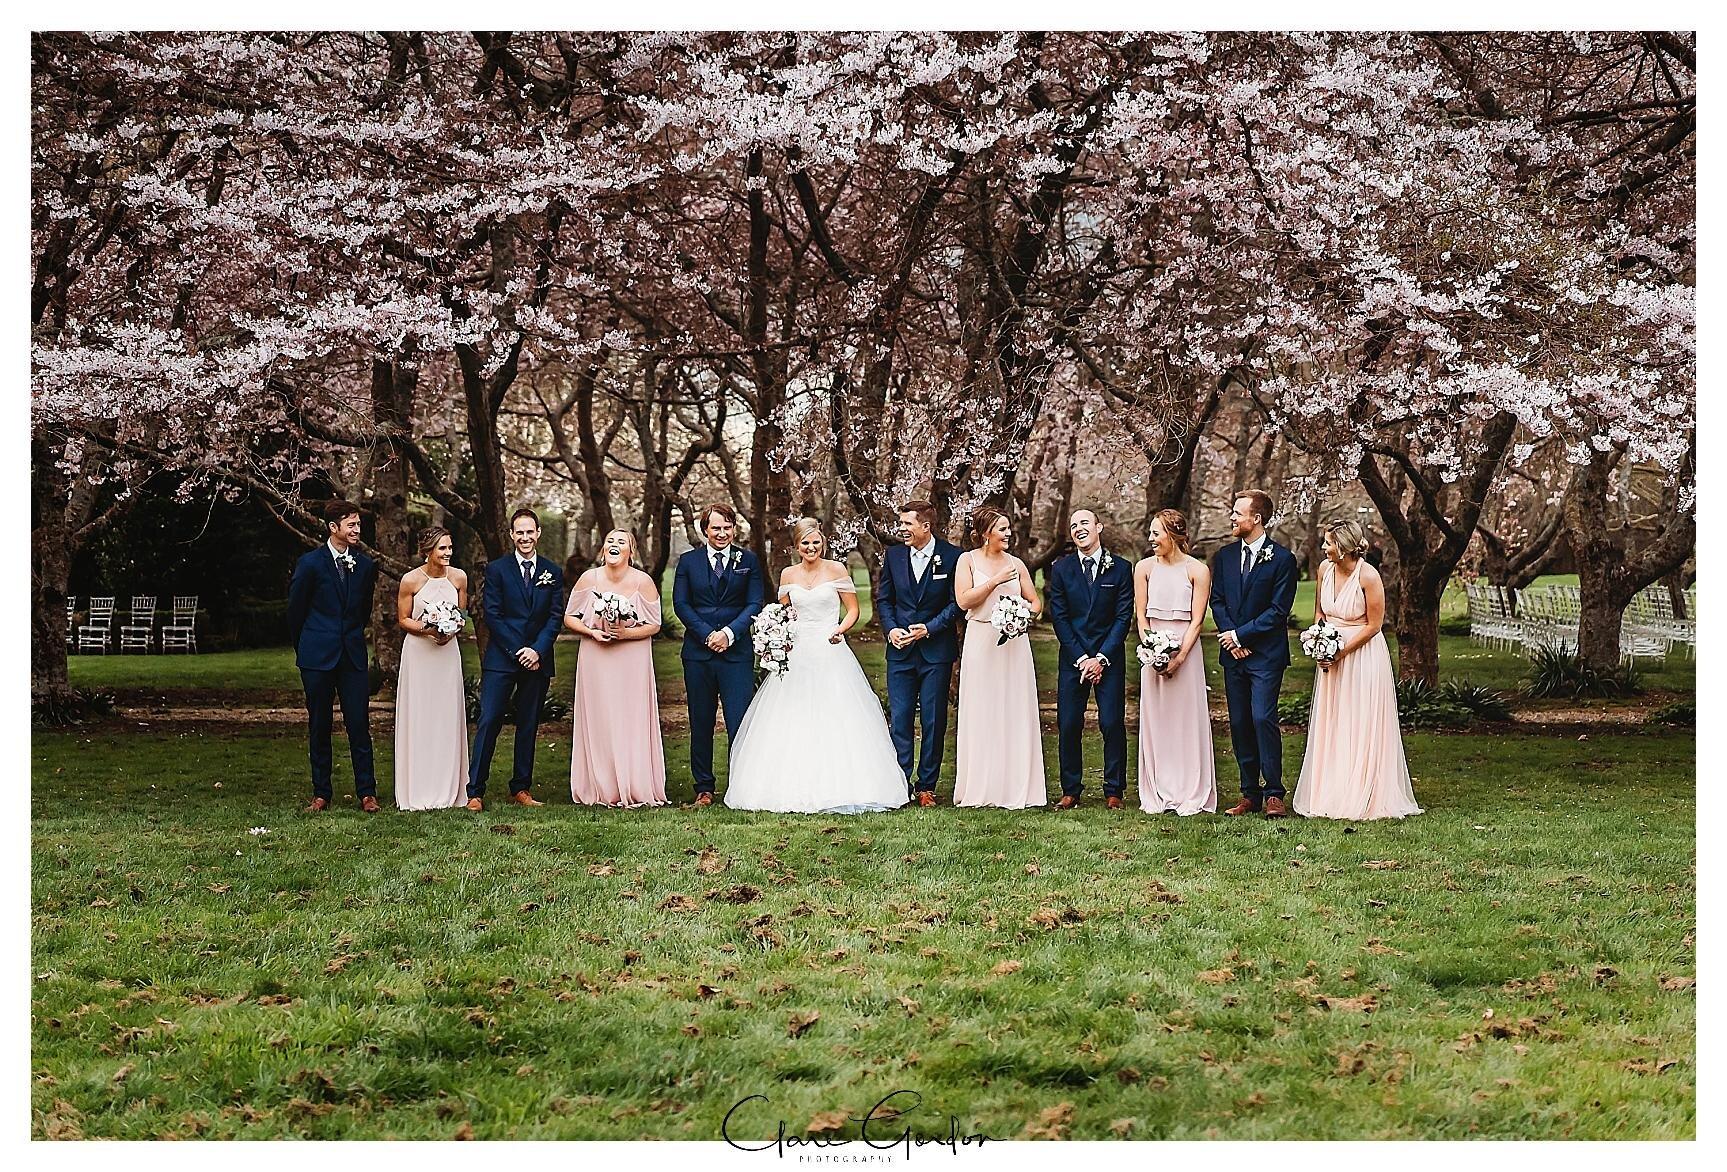 Henley-Hotel-Cherry-blossom-wedding-photos (63).jpg